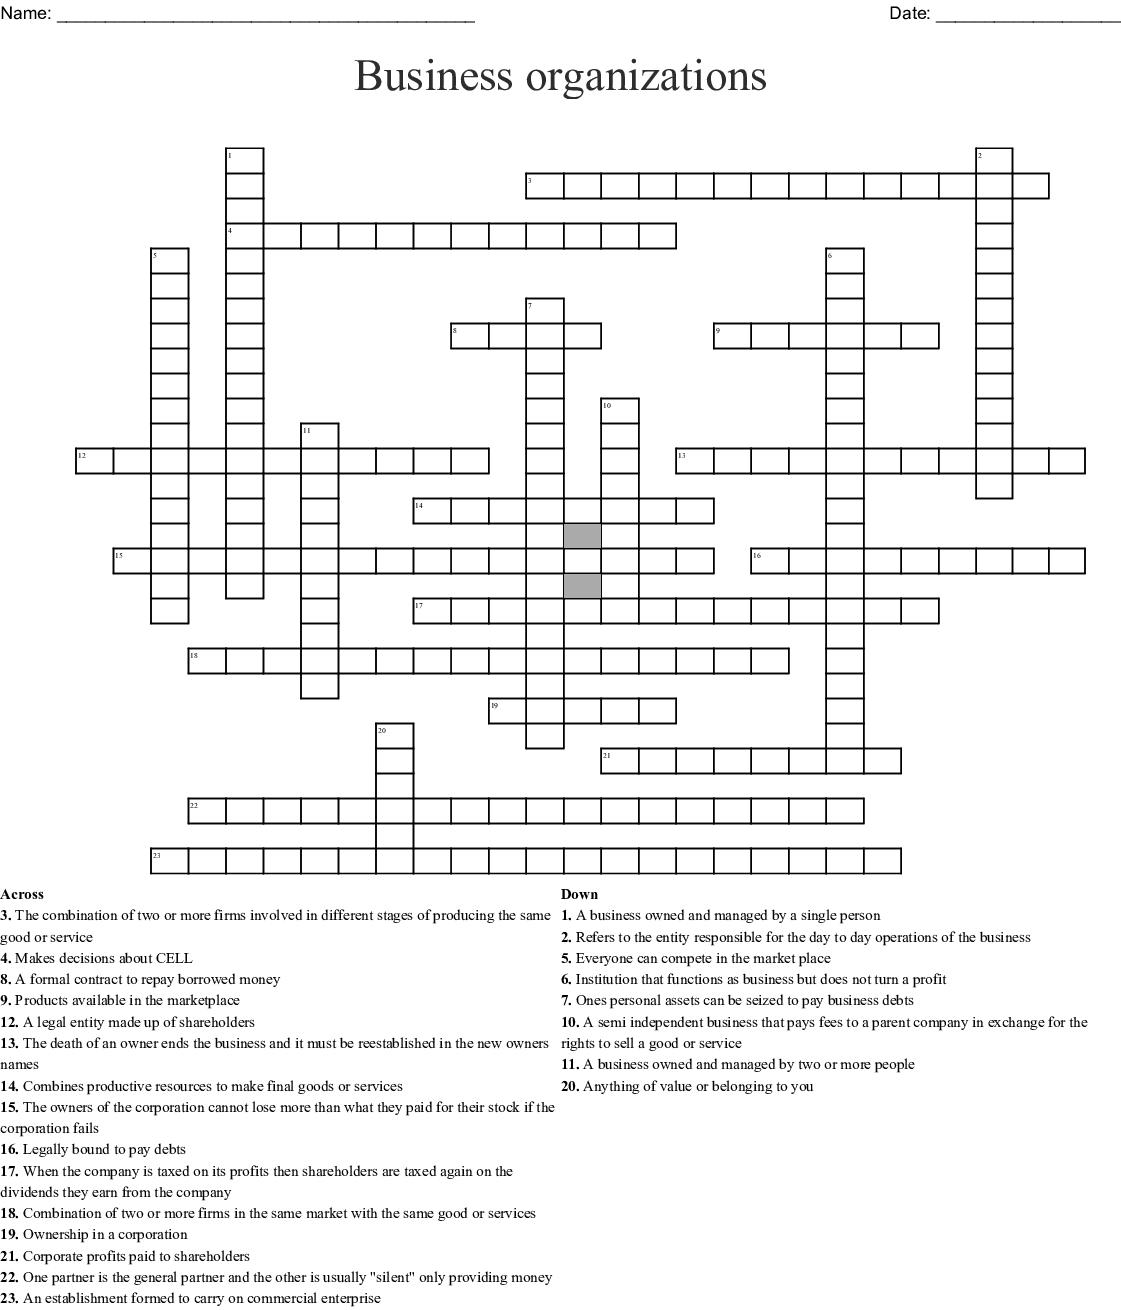 Budgeting Crossword